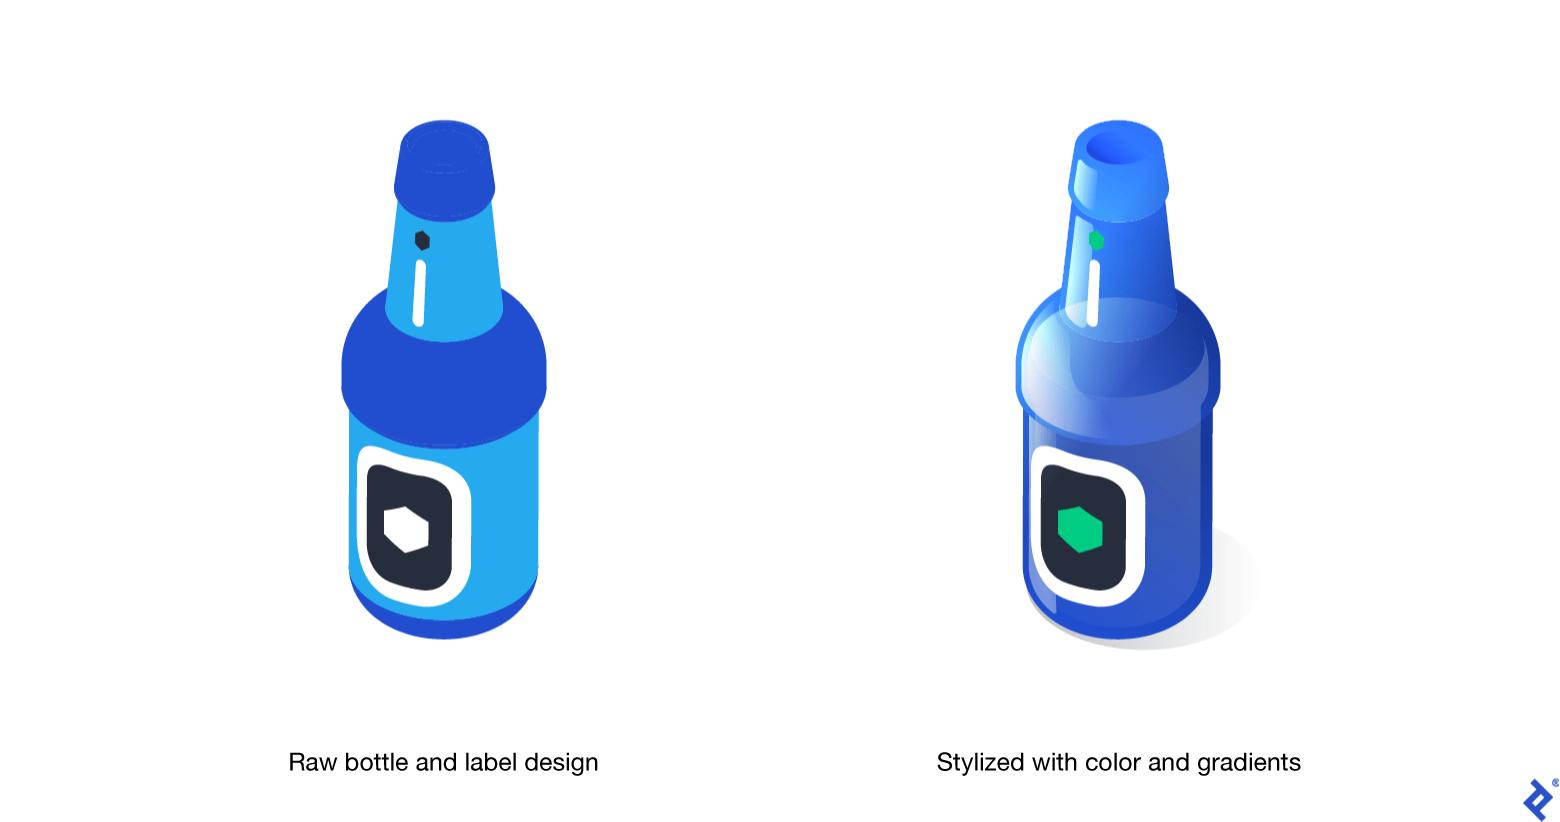 Creating isometric illustrations